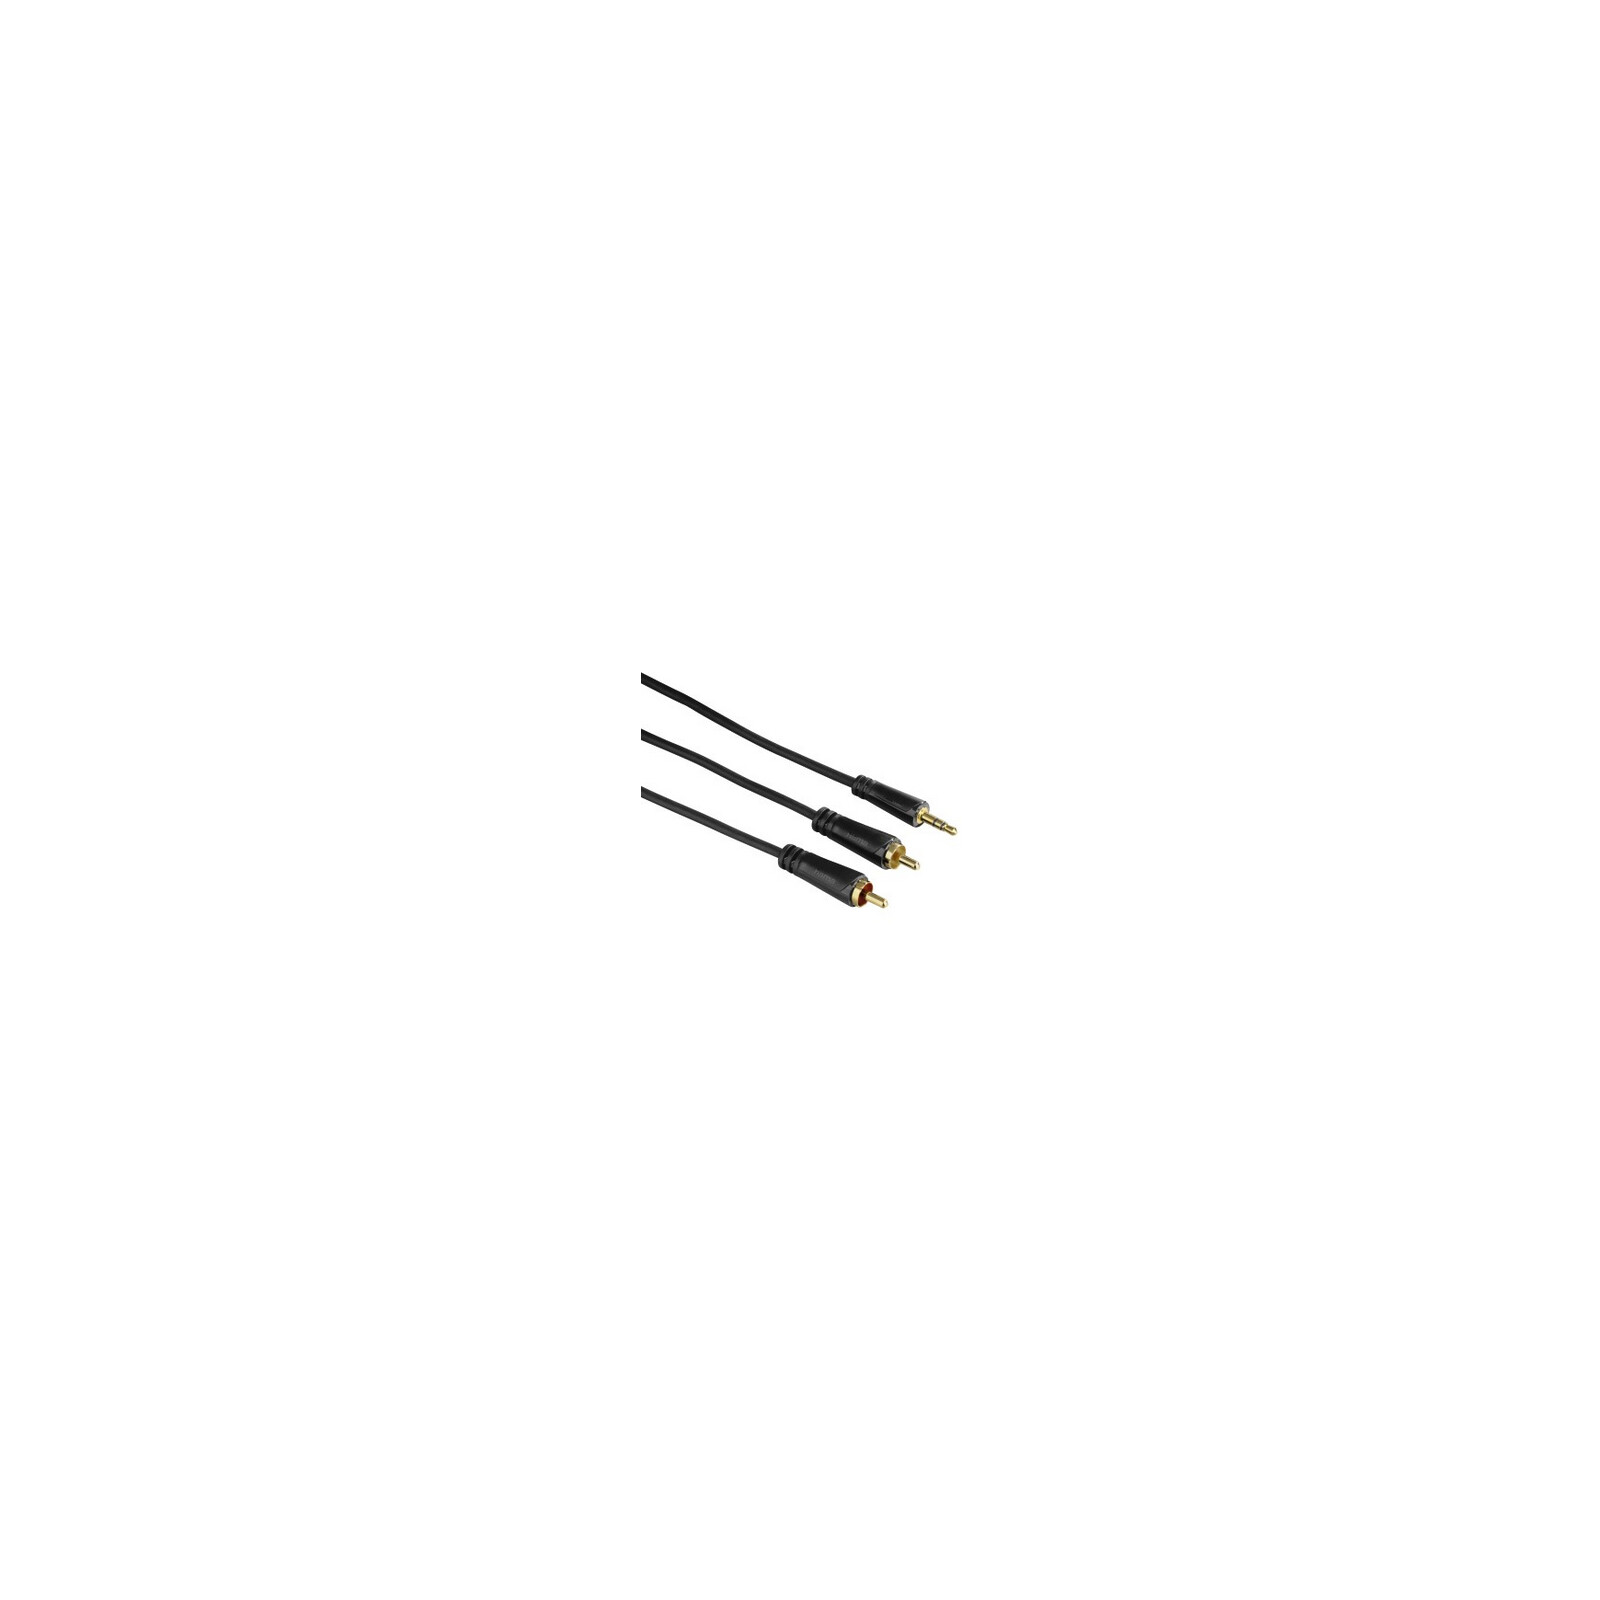 Hama 122301 Audio Kabel 3,5mm Klinken Stecker vergoldet 10m